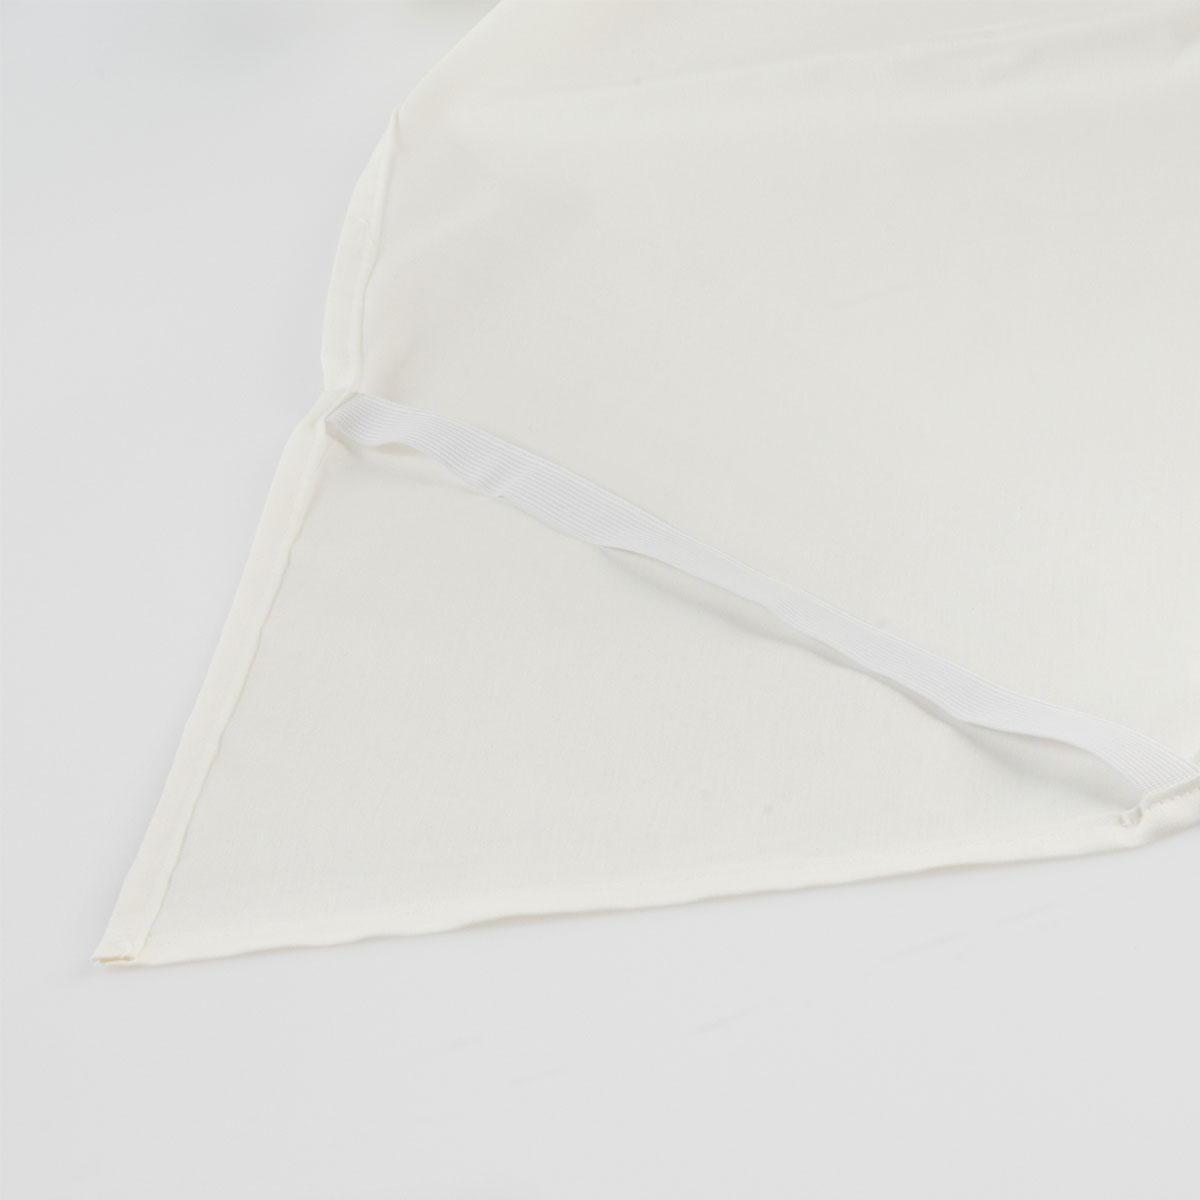 prot ge matelas d perlant forme plateau avec lastiques standard textile. Black Bedroom Furniture Sets. Home Design Ideas